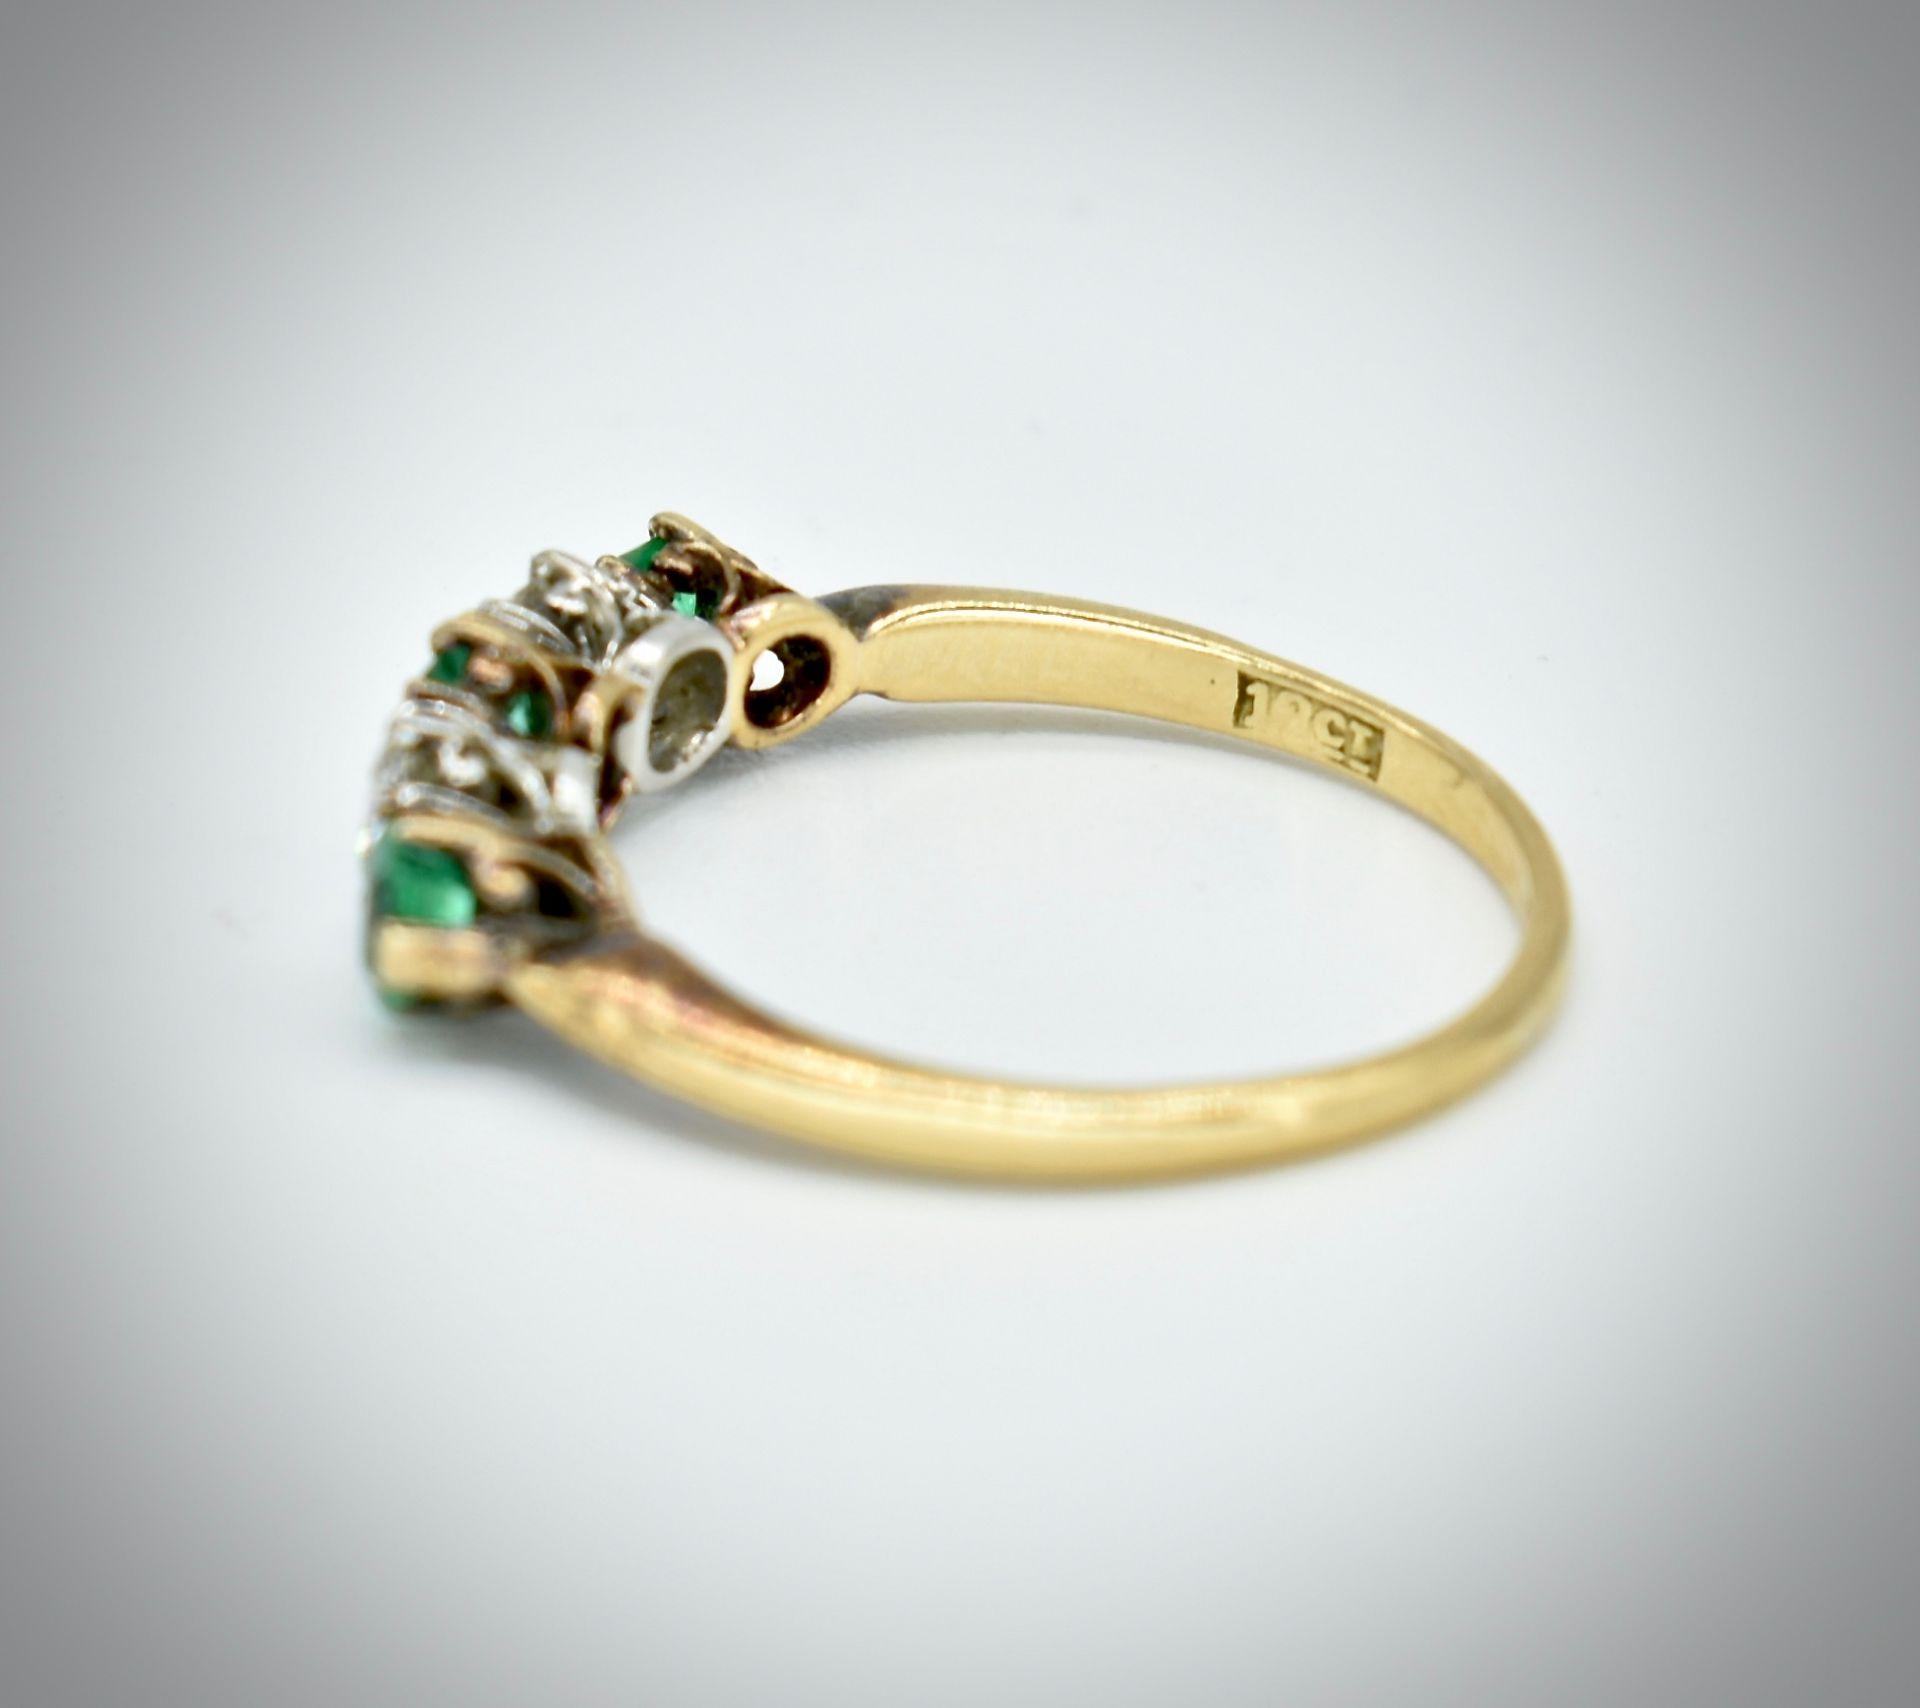 18ct Gold Emerald & Diamond Five Stone Ring - Image 3 of 7